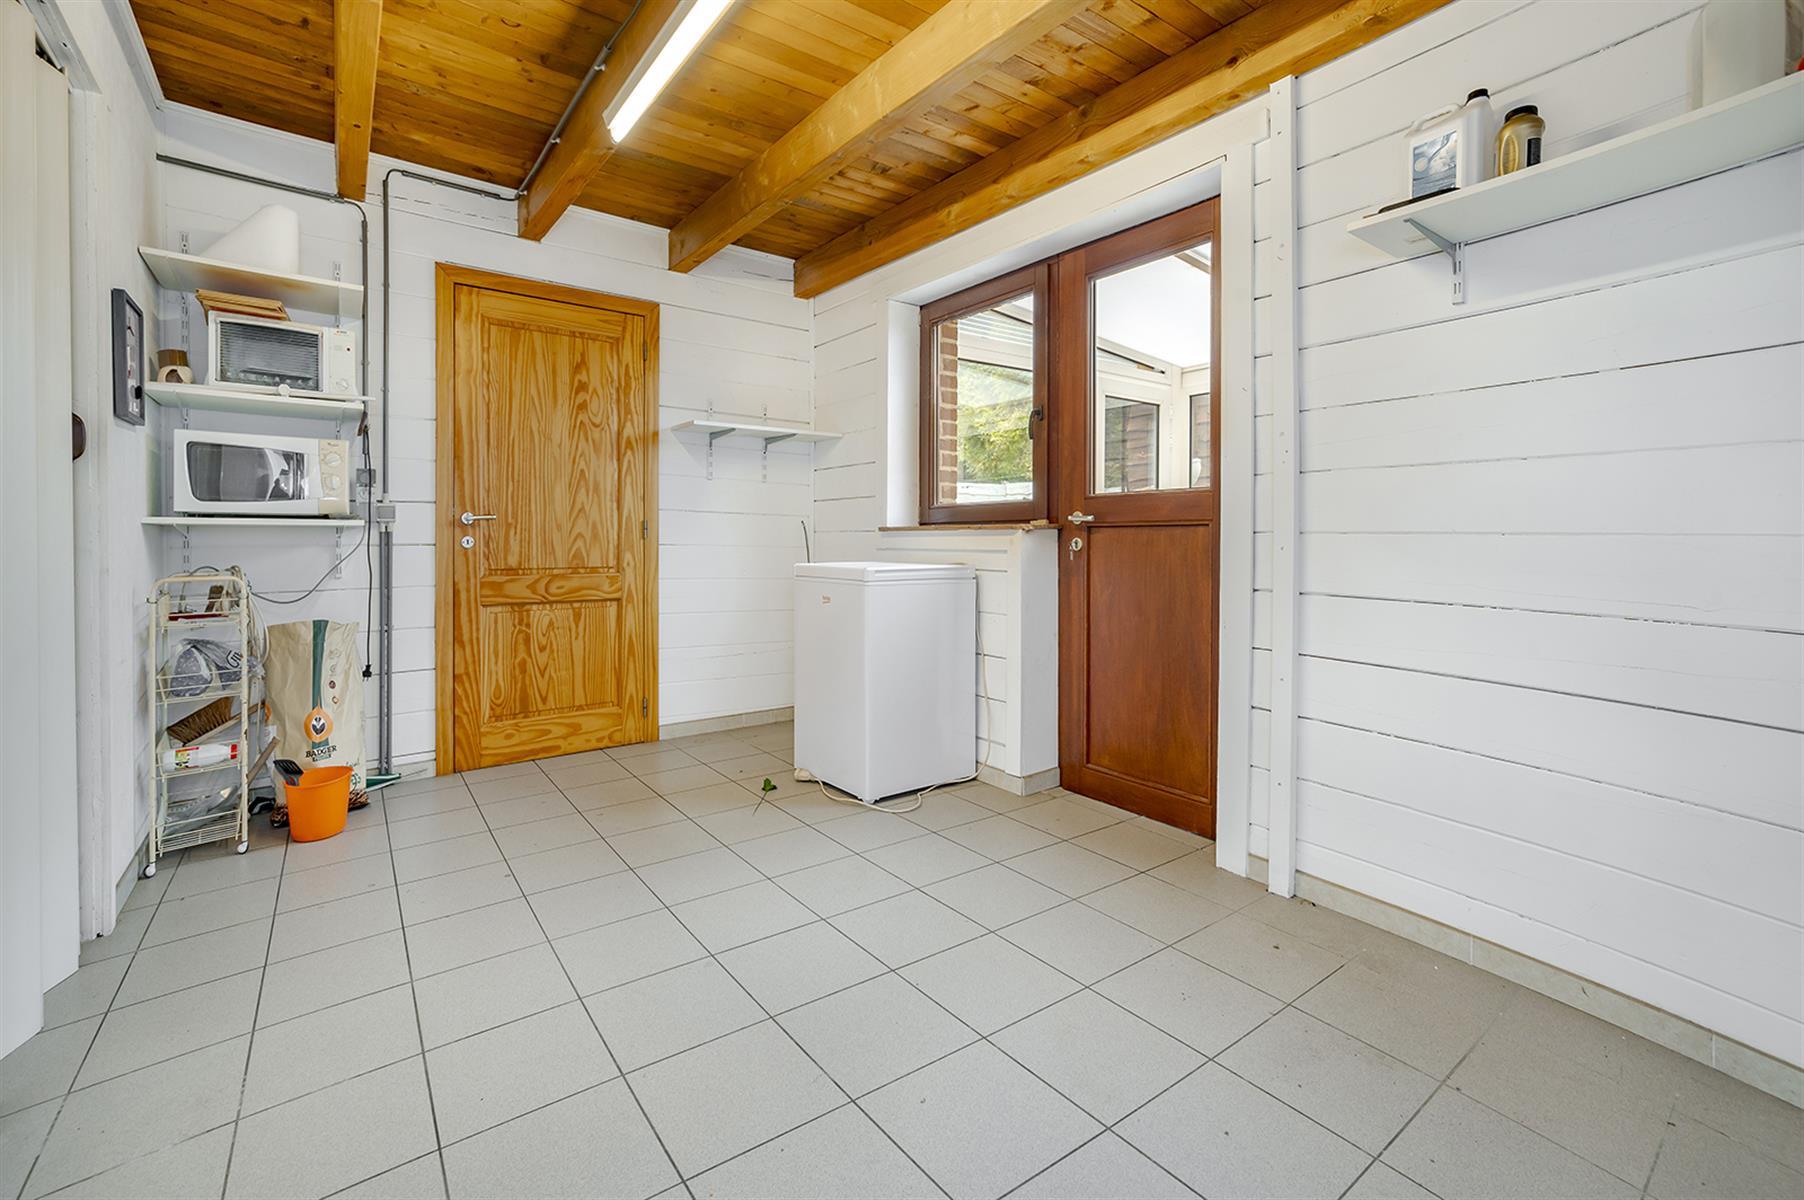 Maison - Berloz - #4189505-9